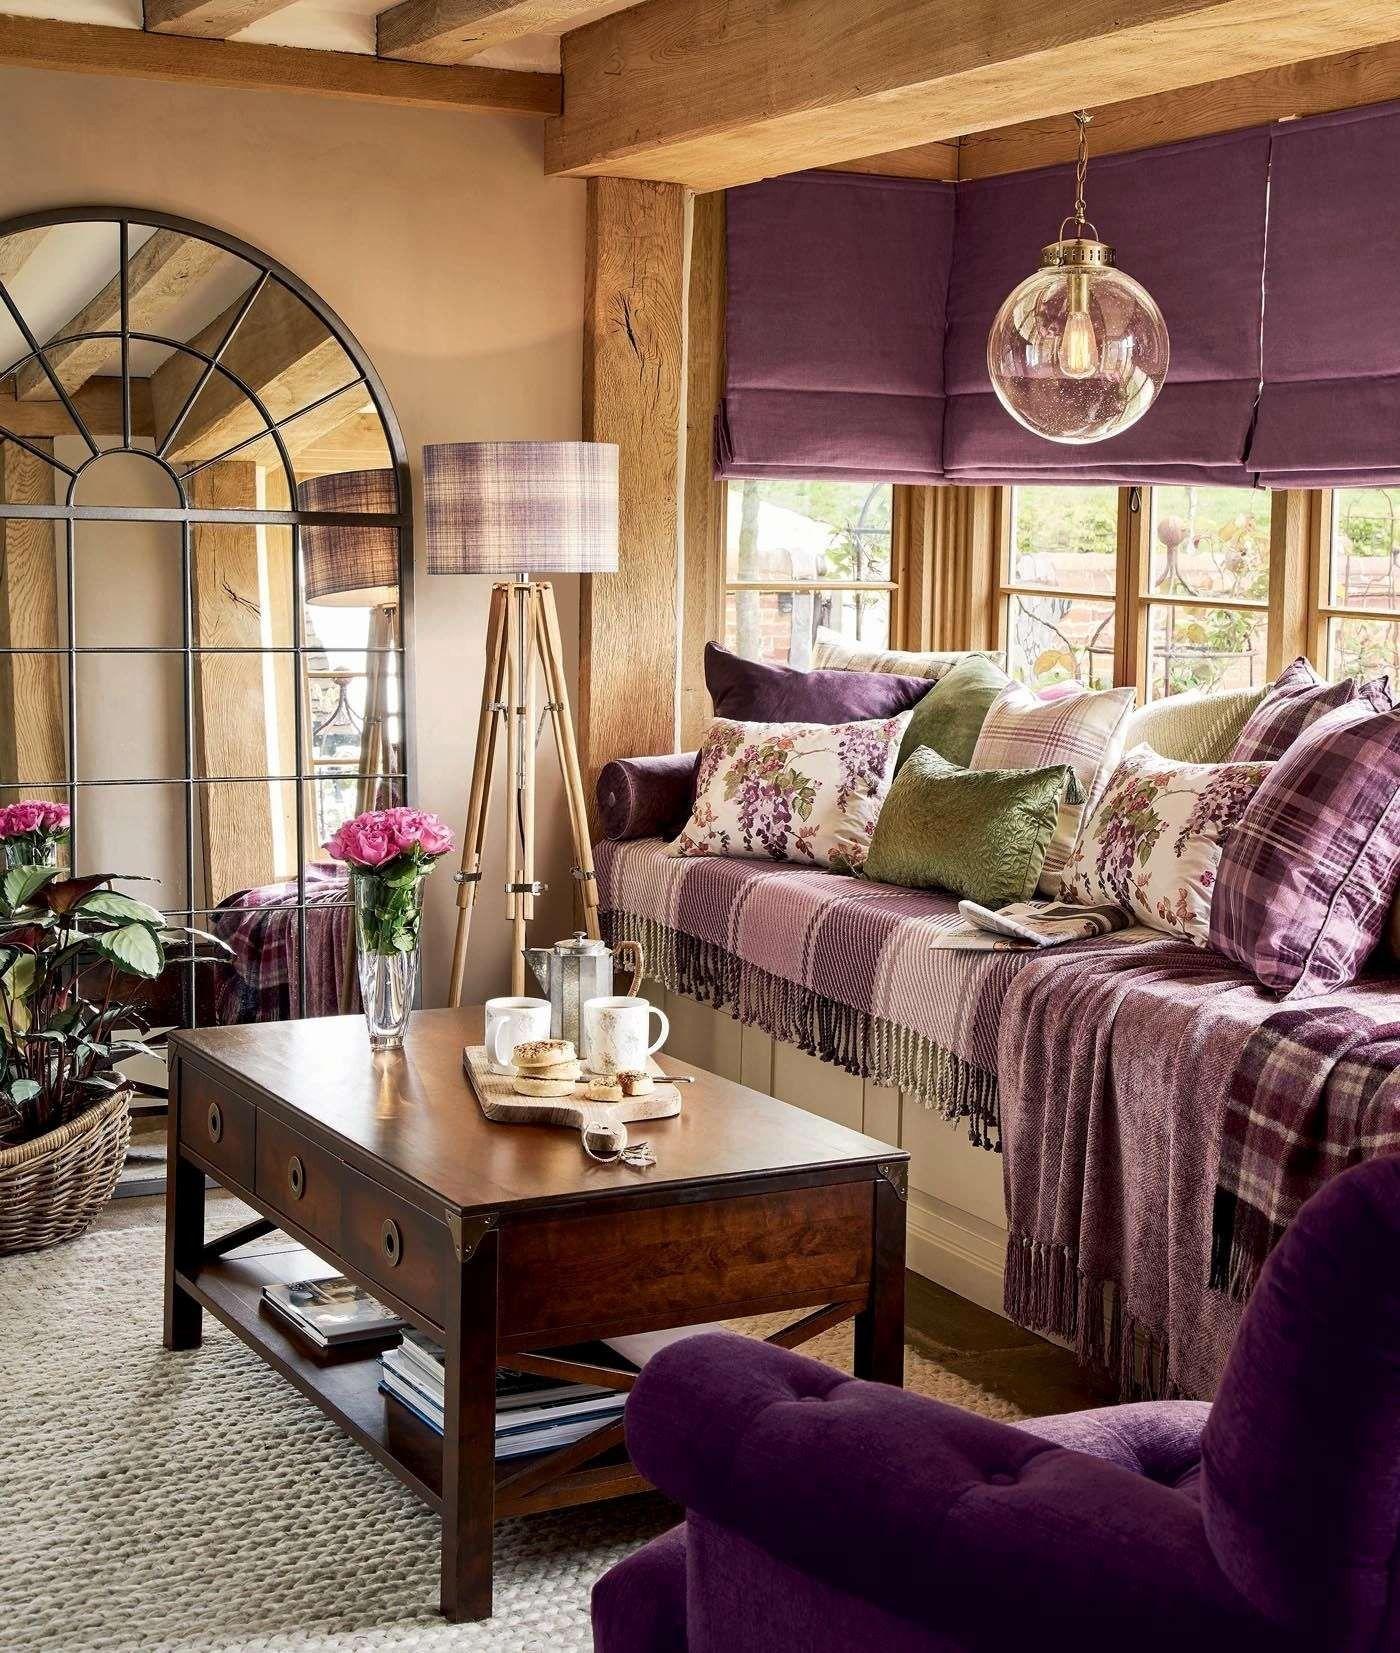 Fashionable Room Concepts June 2018 Purple Living Room Plum Living Rooms Living Room Accessories #purple #living #room #accessories